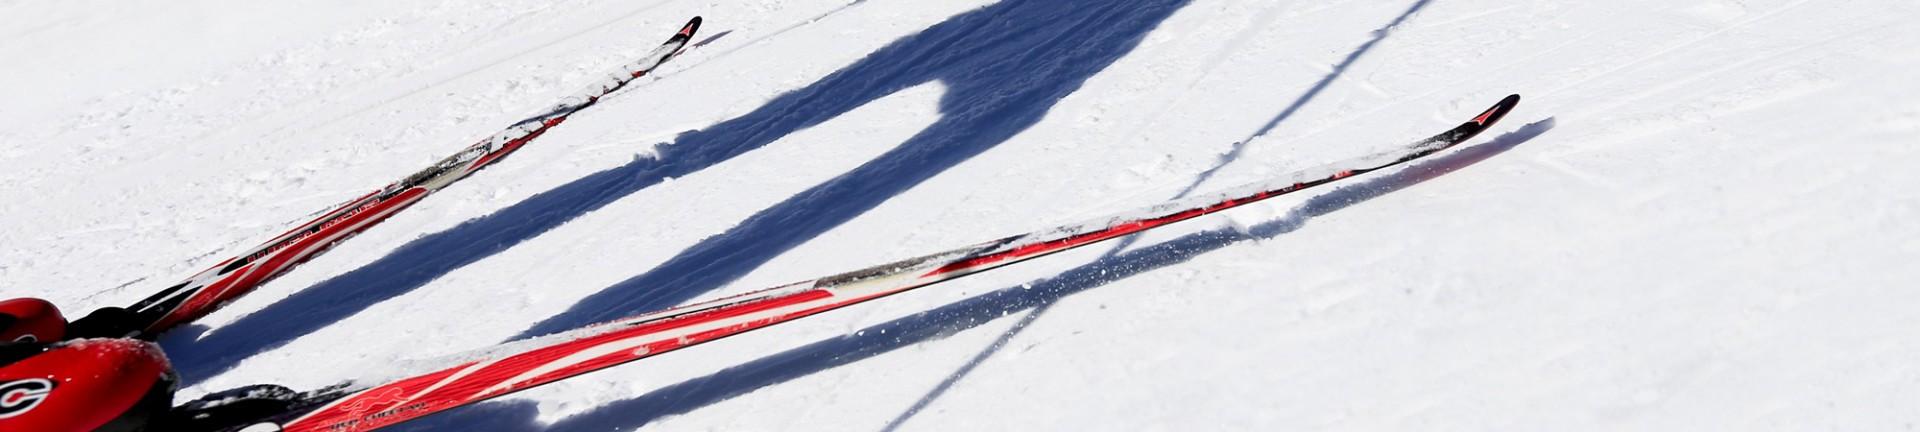 Ski nordique hautes combes